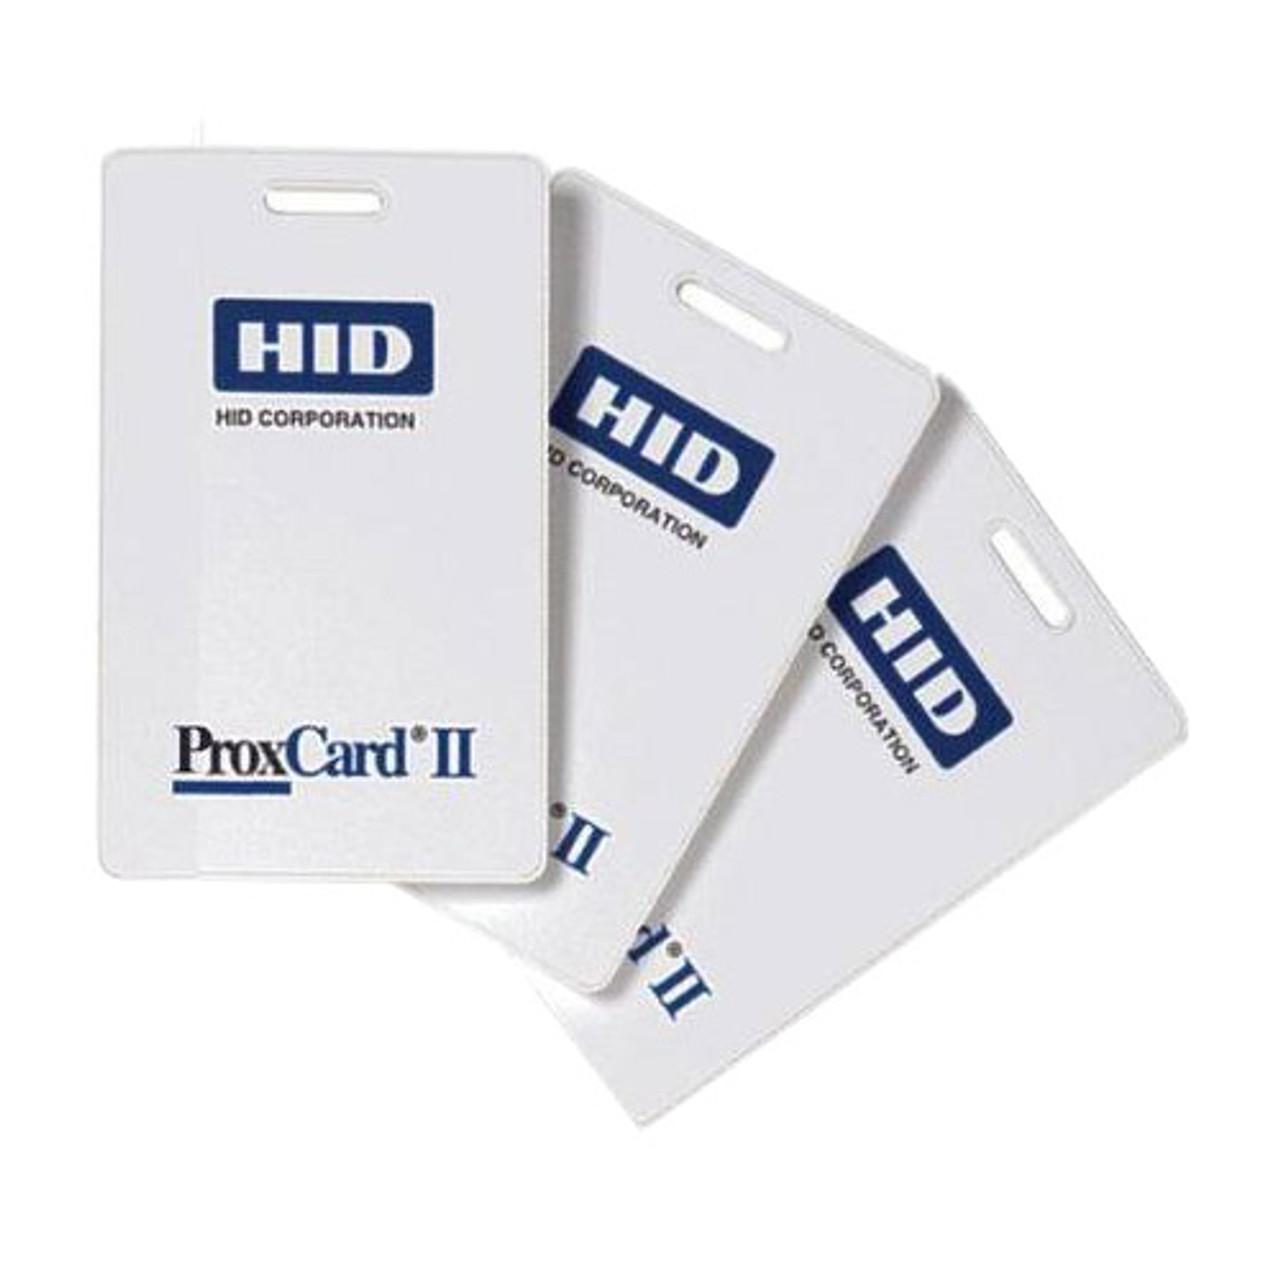 ALHID1326 Alarm Lock Networx Proximity Access Cards